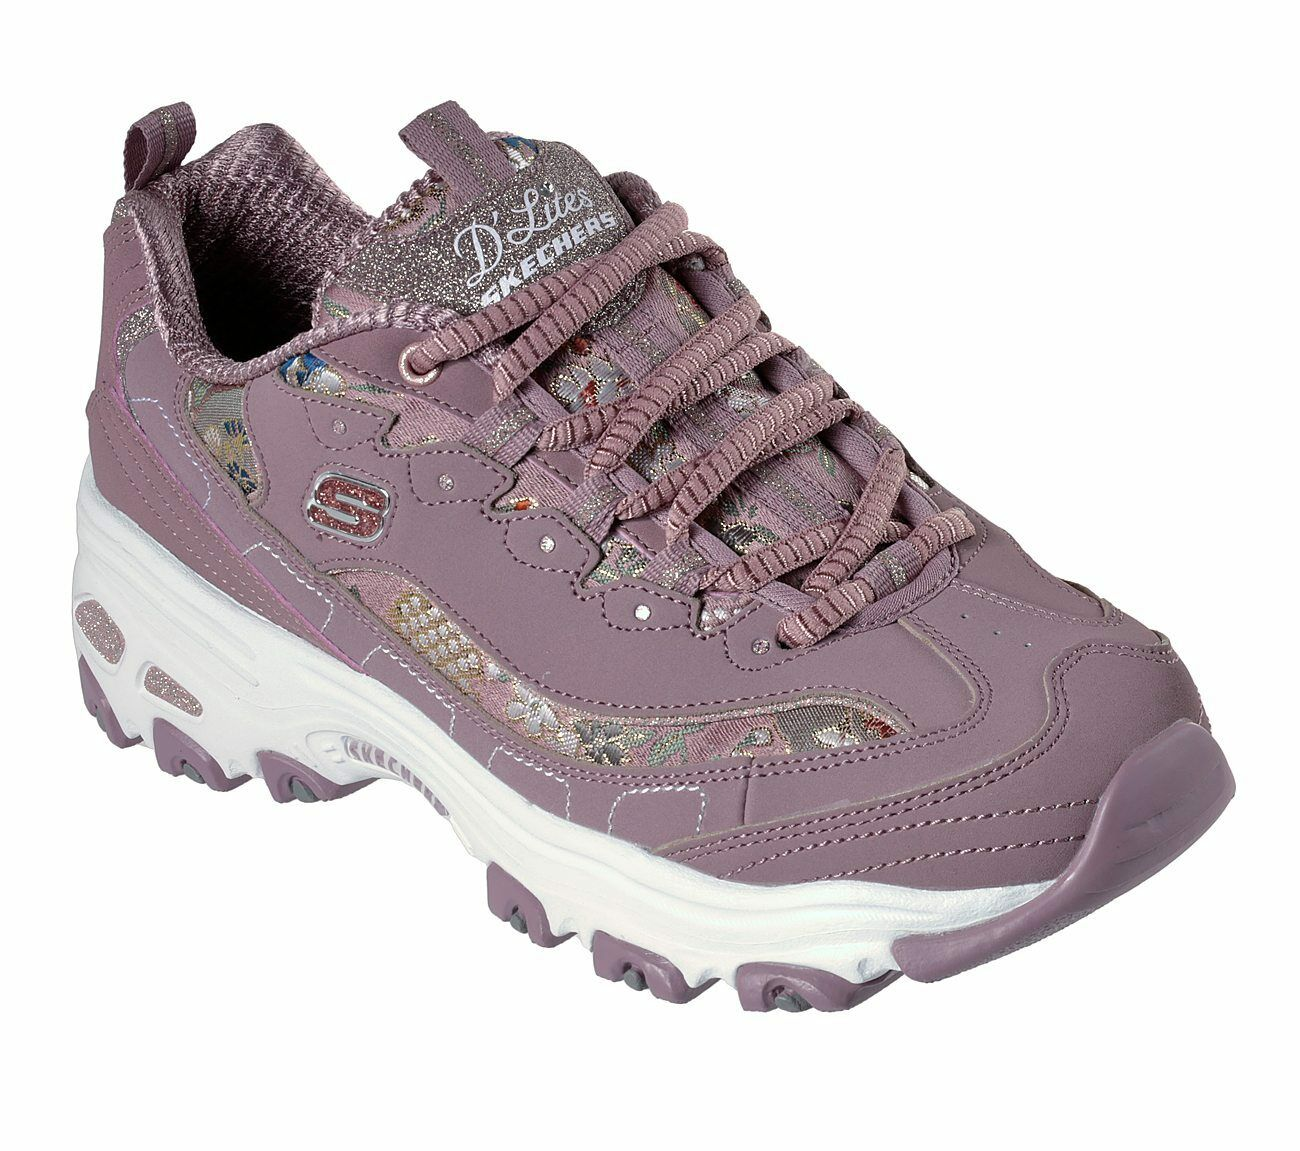 6158250d3d62d Skechers D Lites - Floral Days Trainers Womens Memory Foam Chunky Shoes  13082